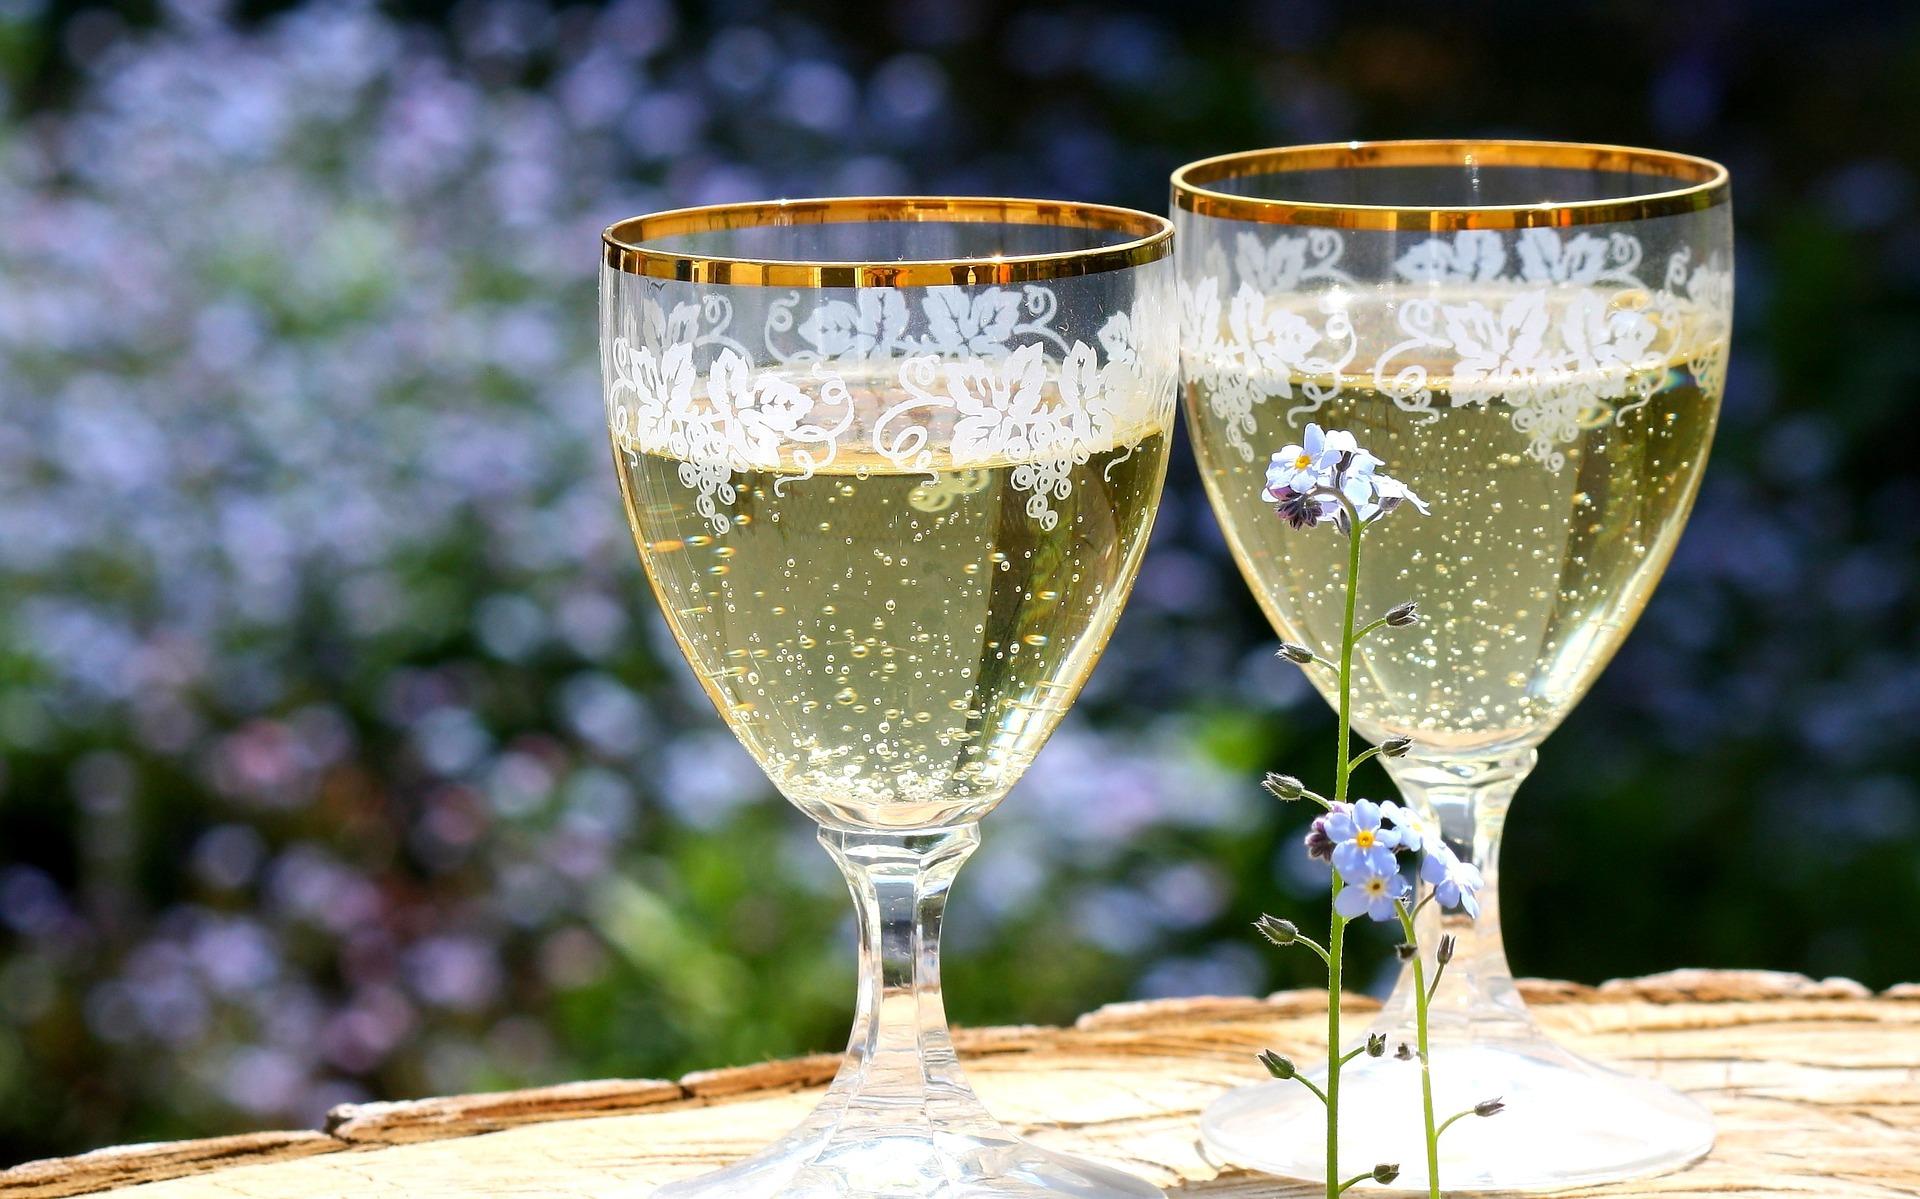 Cava, Spanish sparkling wine.